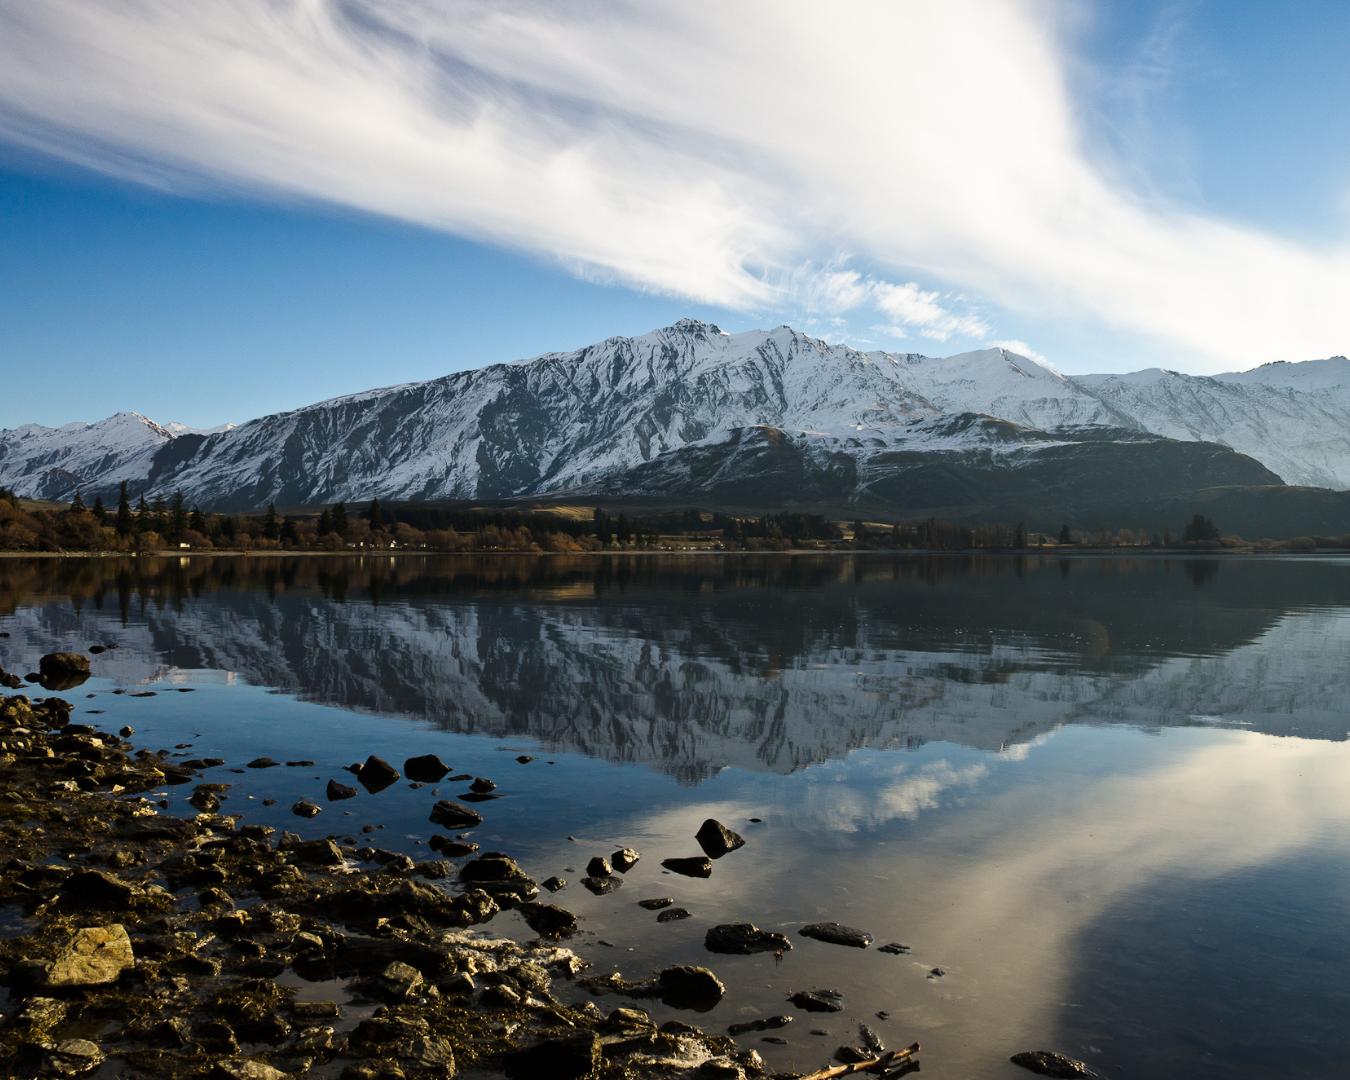 Crystal clear and snowy lake reflection of Glendu Bay